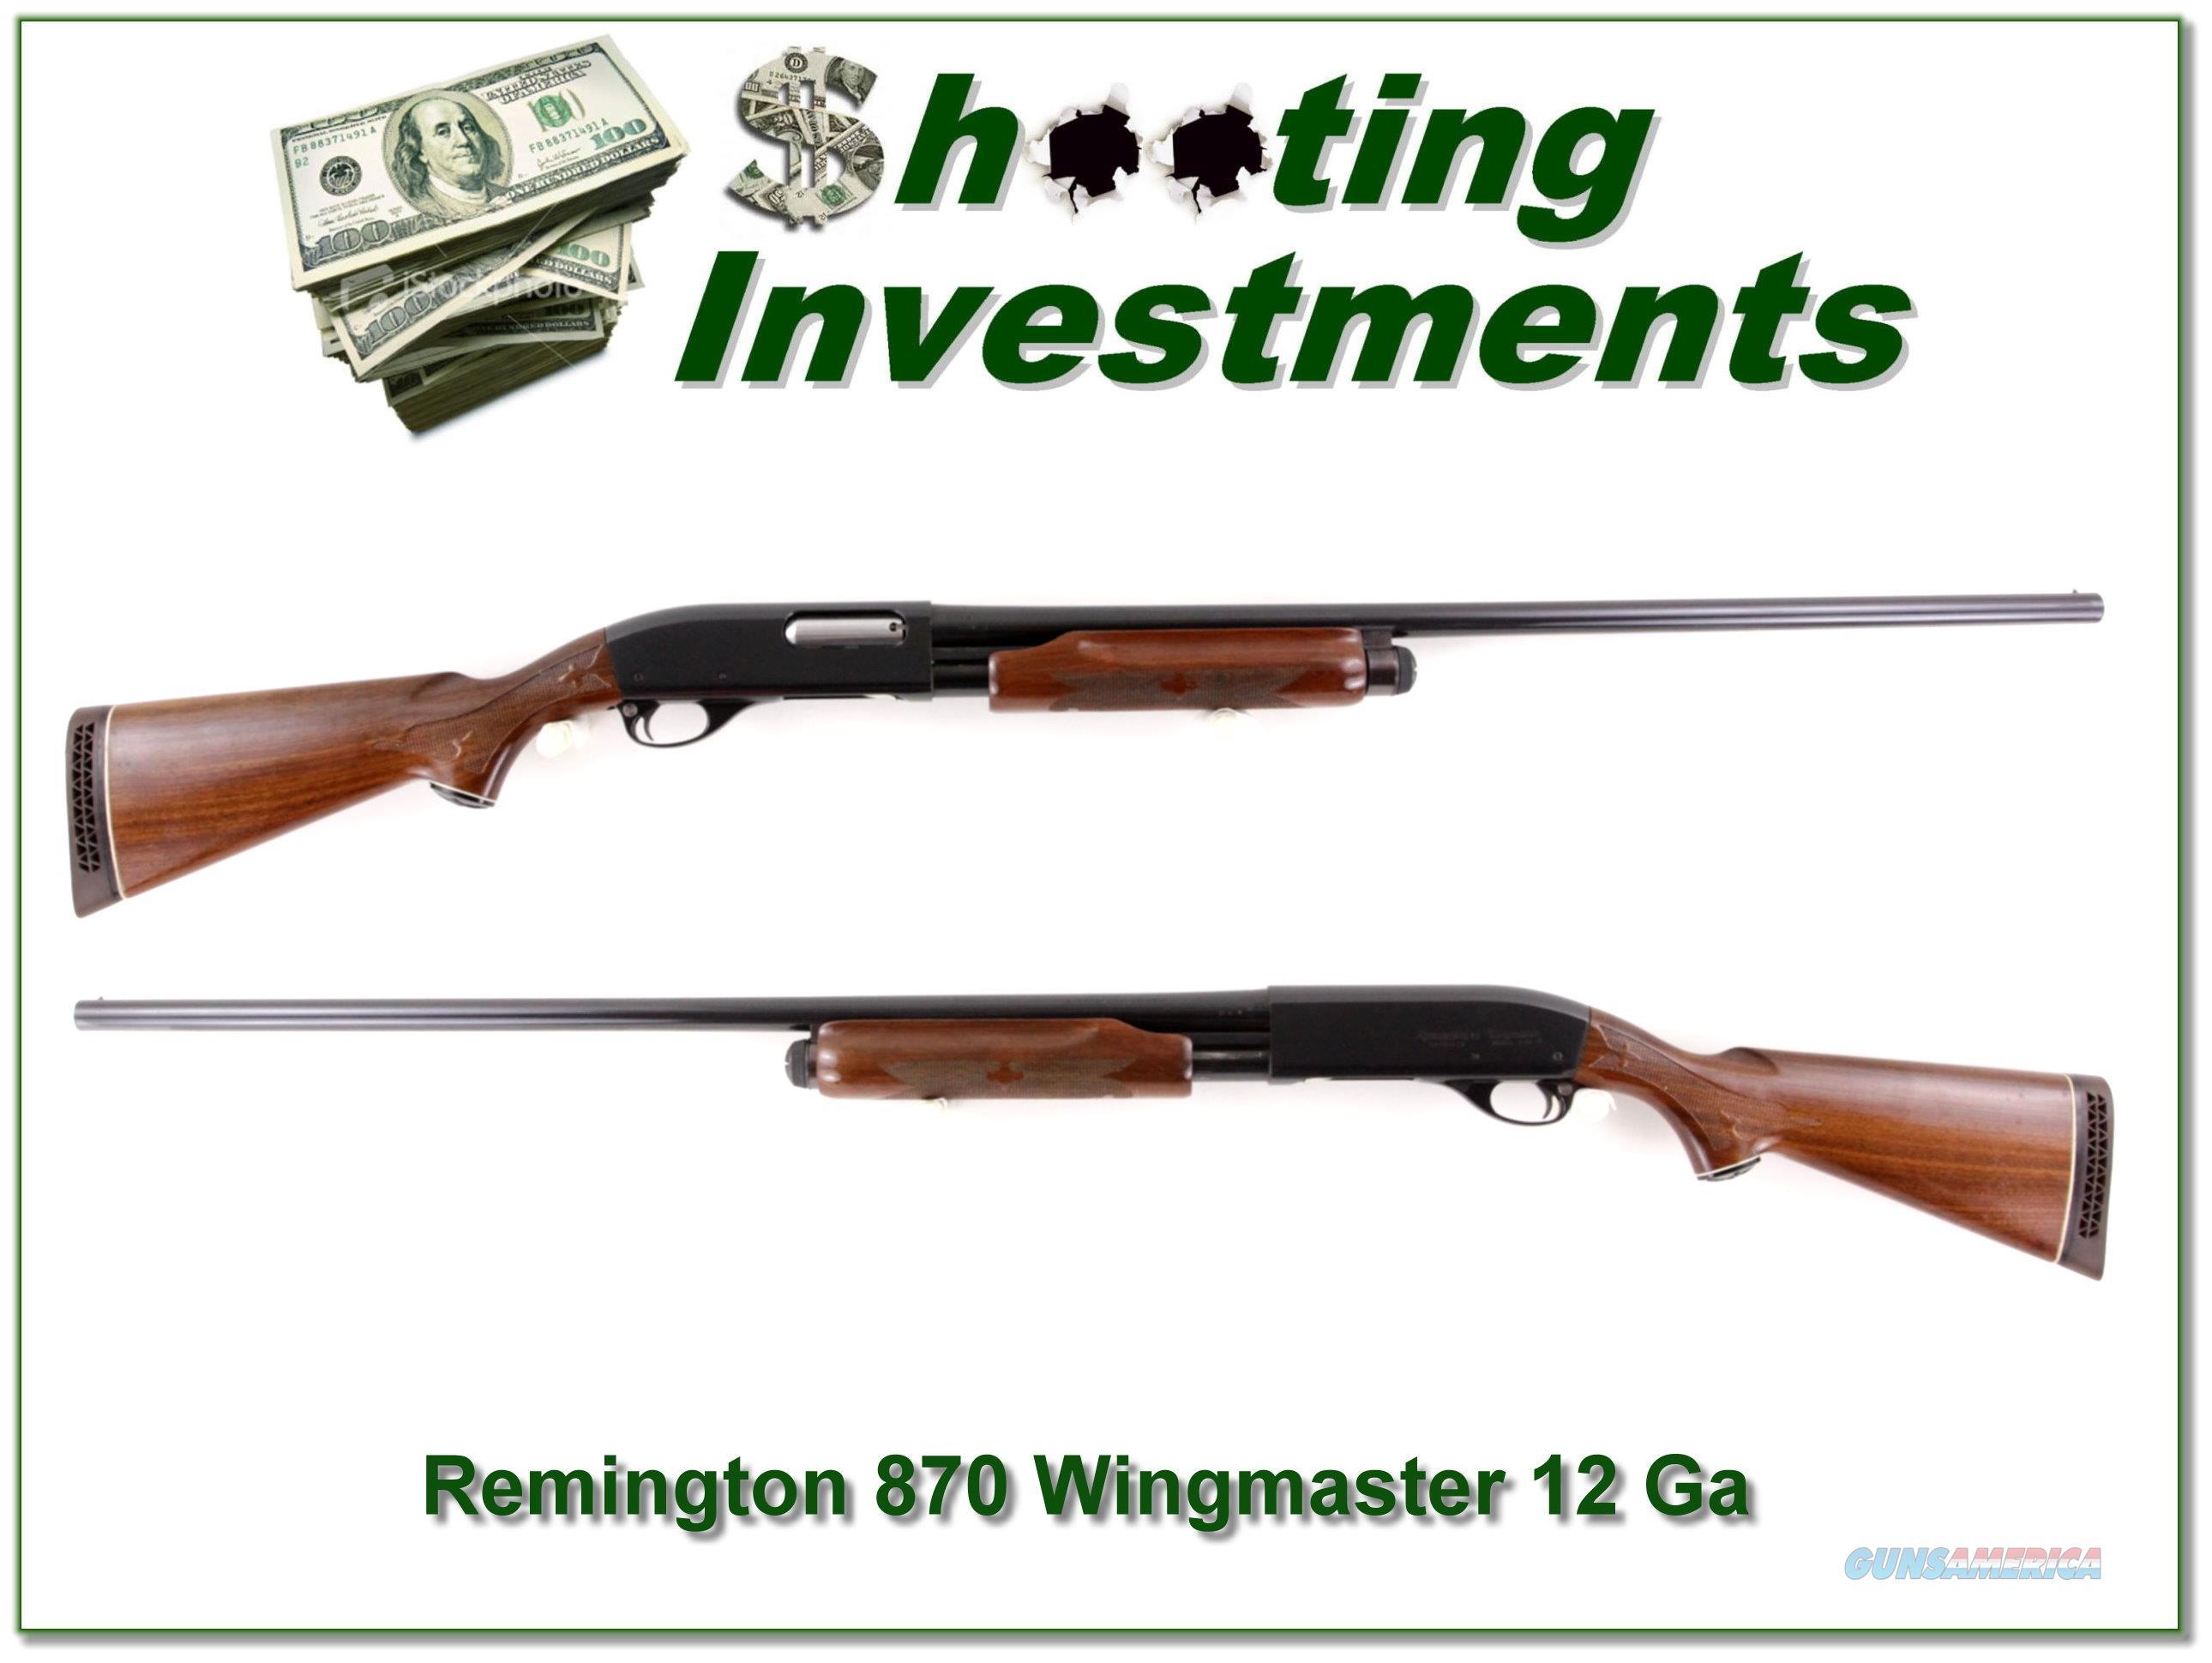 Remington 870 Wingmaster 12 Ga Exc Cond!  Guns > Shotguns > Remington Shotguns  > Pump > Hunting